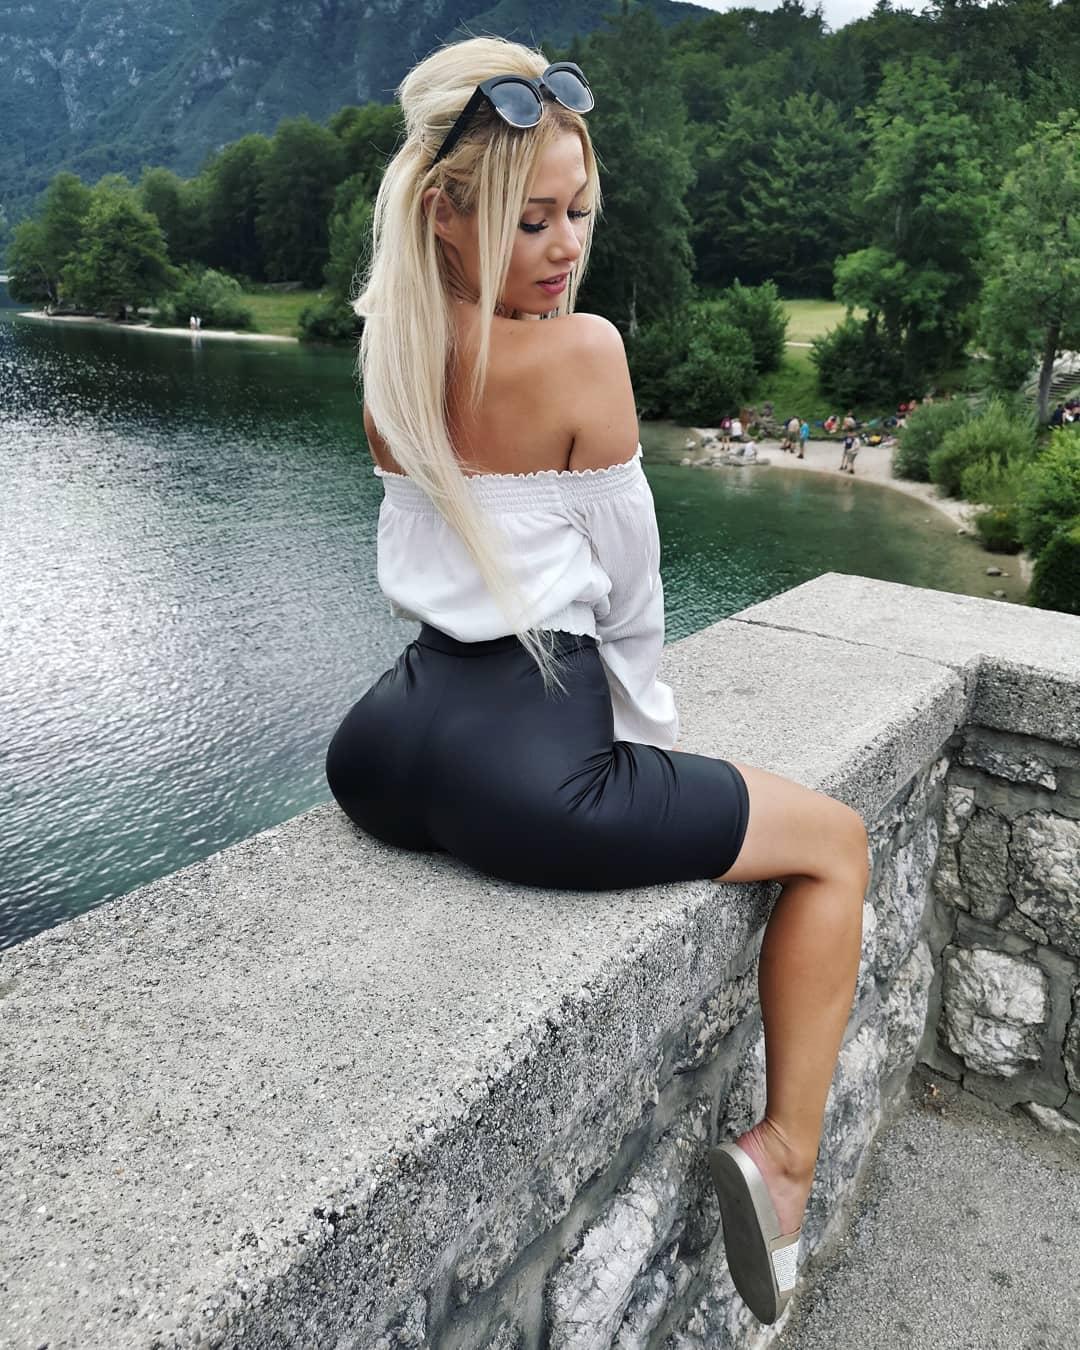 Petra-Svoboda-Wallpapers-Insta-Fit-Bio-2